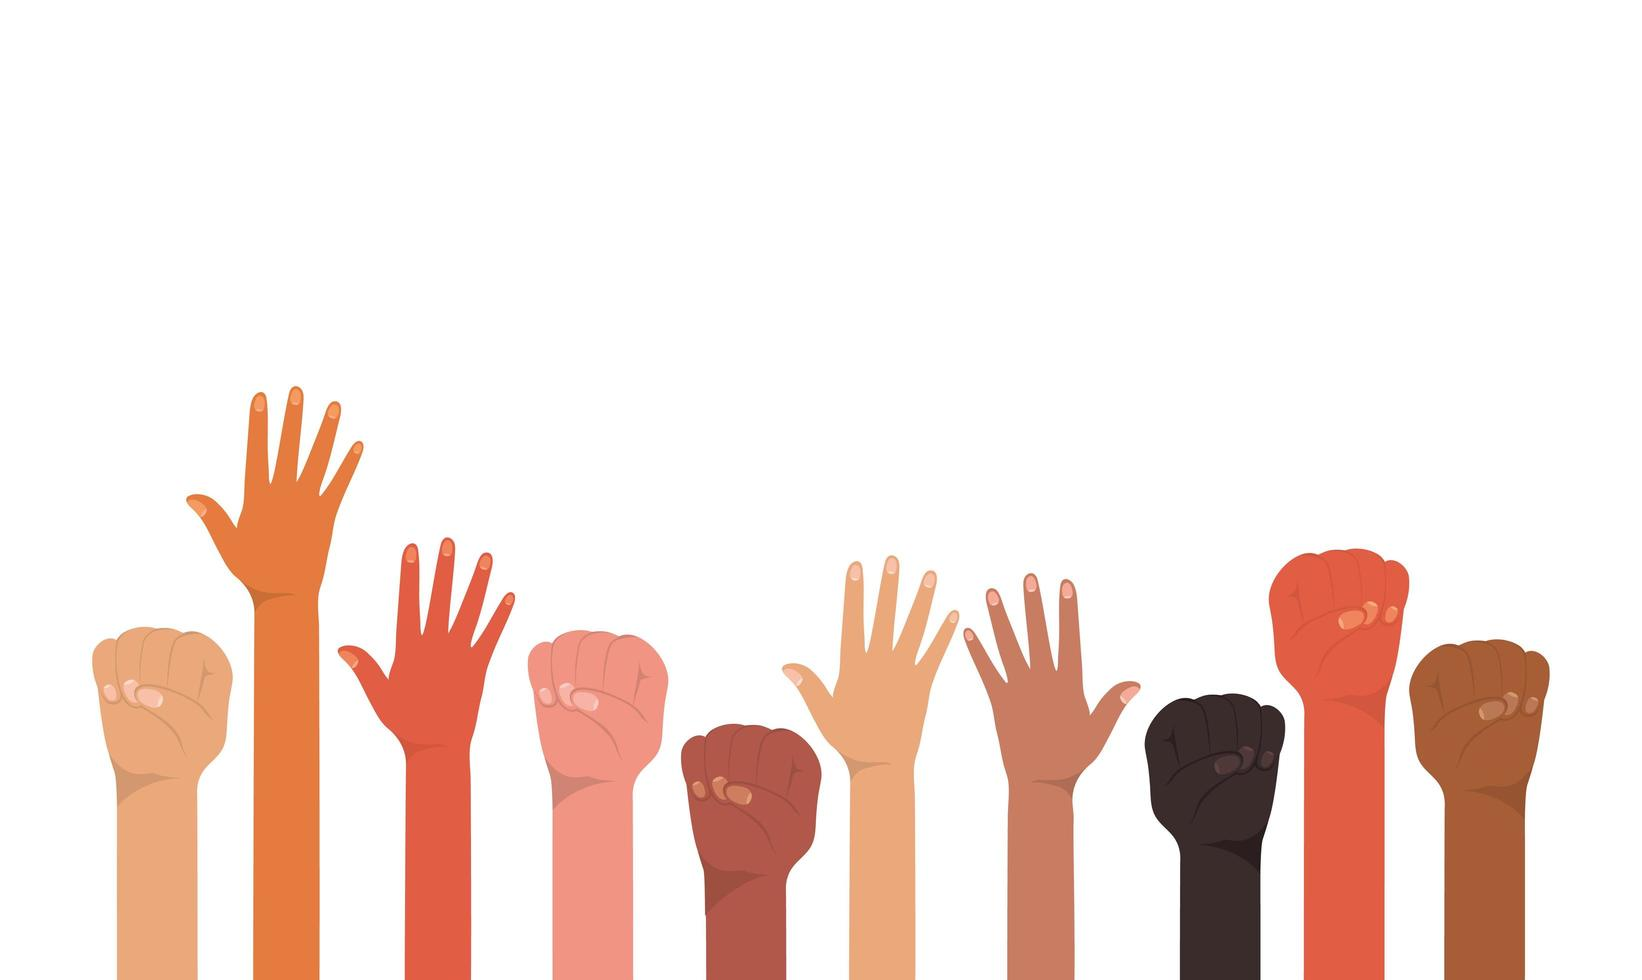 knytnäve och öppna händerna uppåt vektor